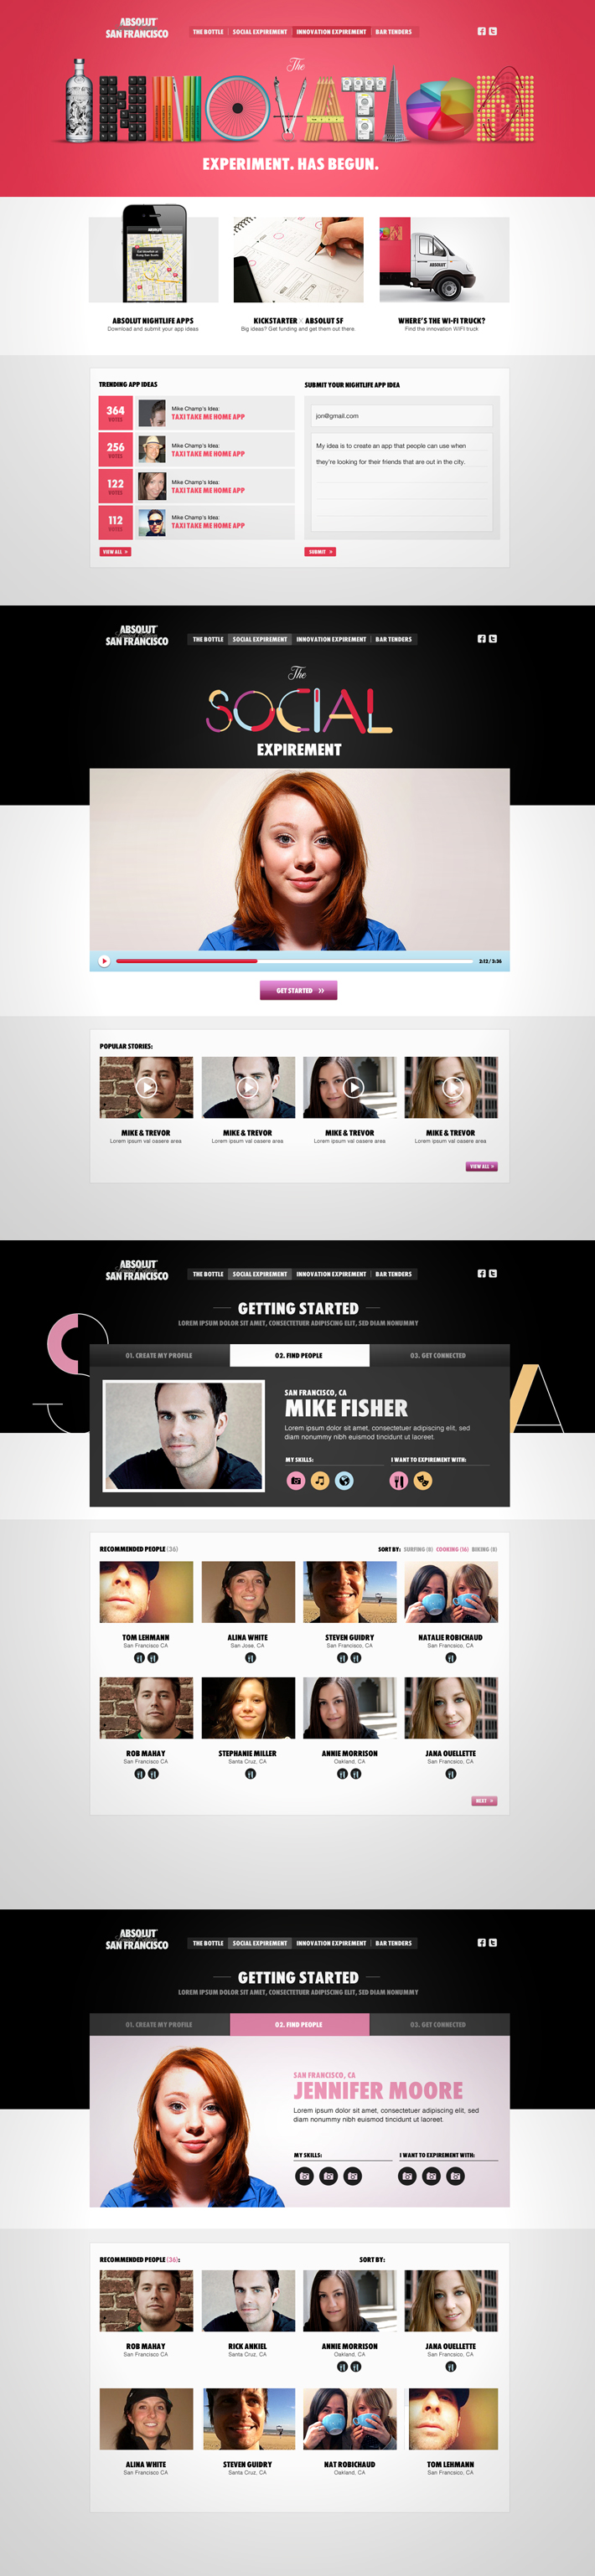 Talentueux webdesigner